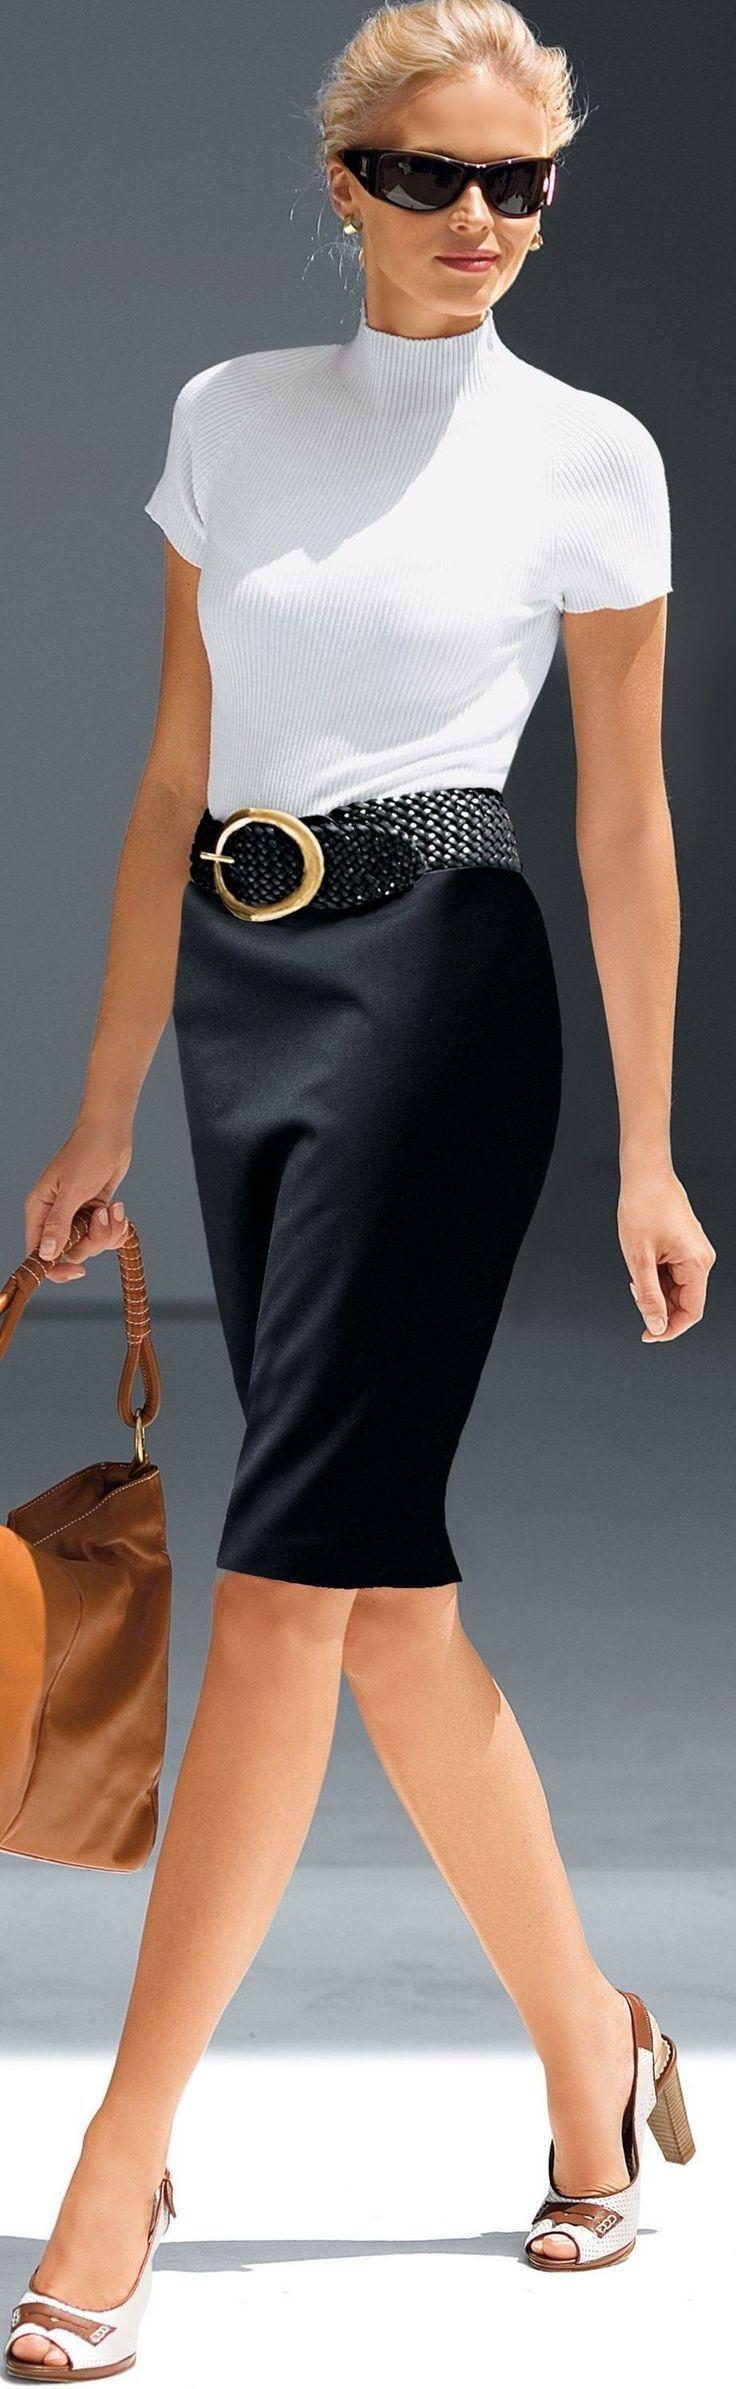 Mock Turtleneck Black White Business Casual Belted Pencil Skirt